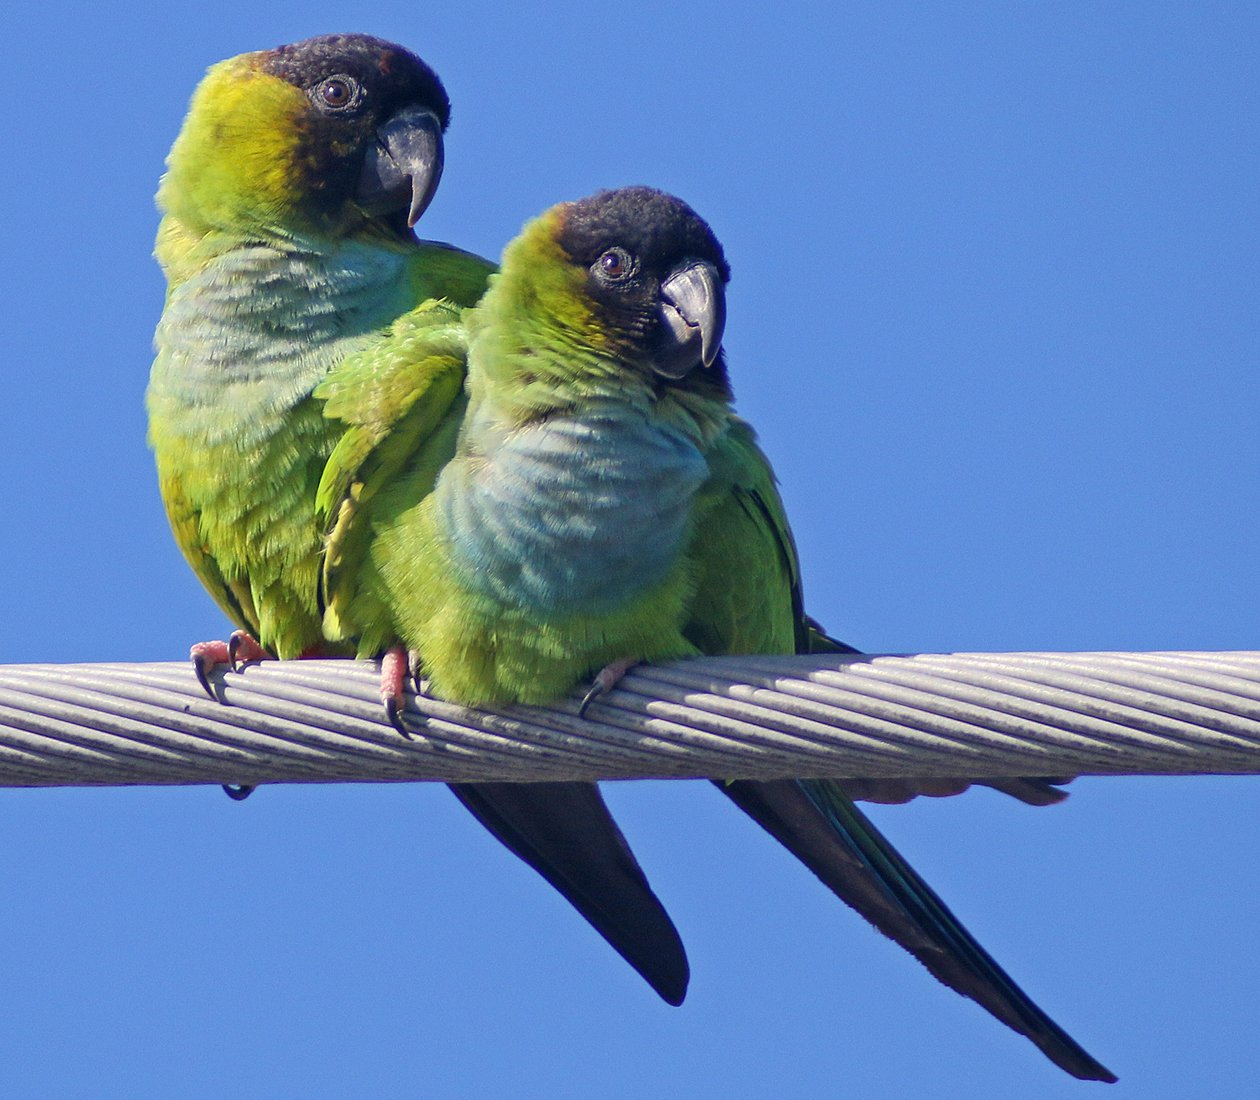 Nanday Parakeets cuddling